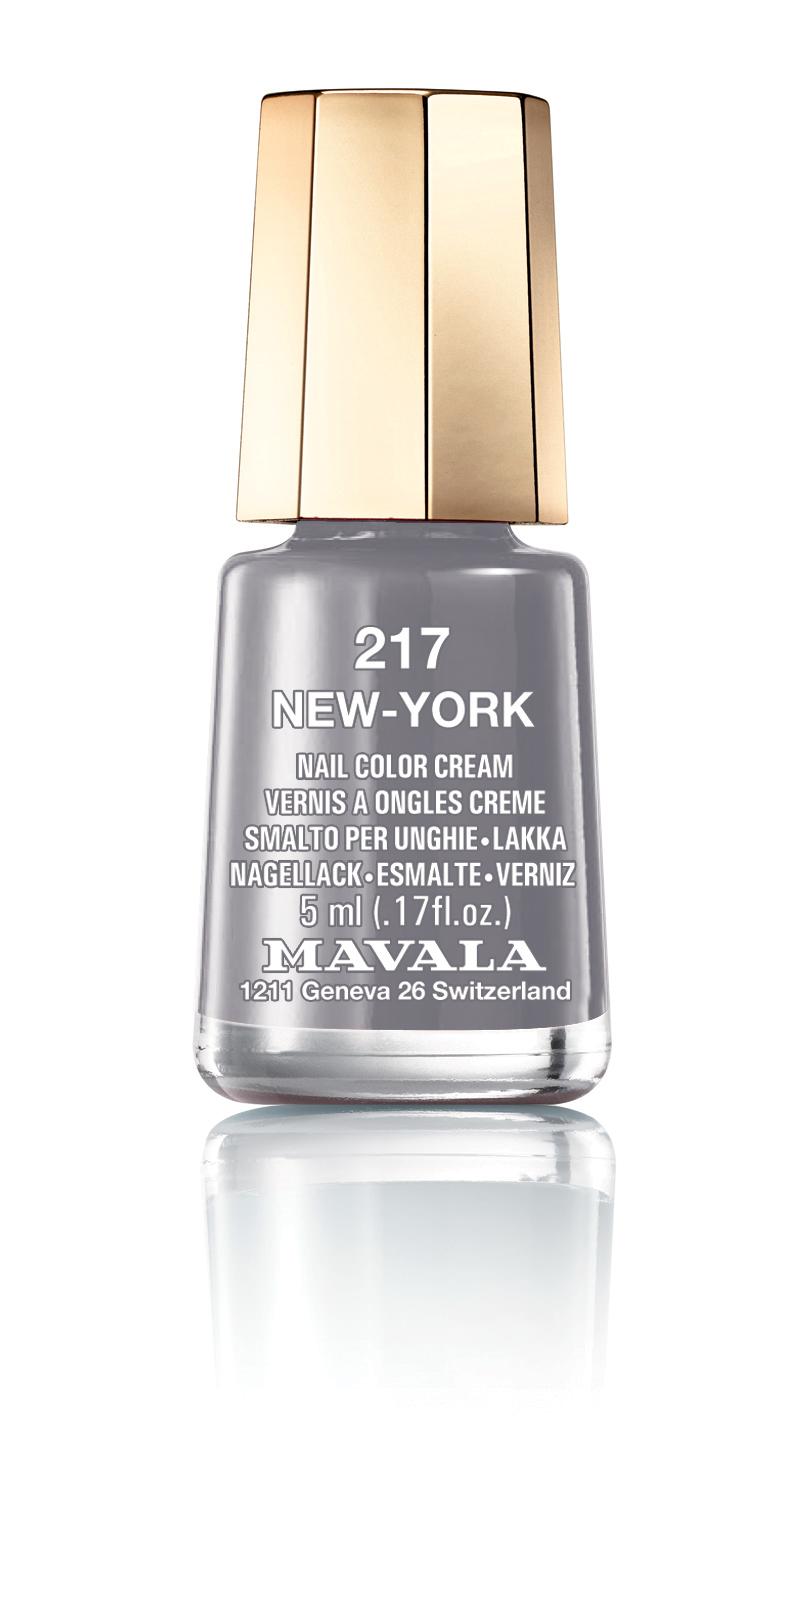 217 NEW YORK